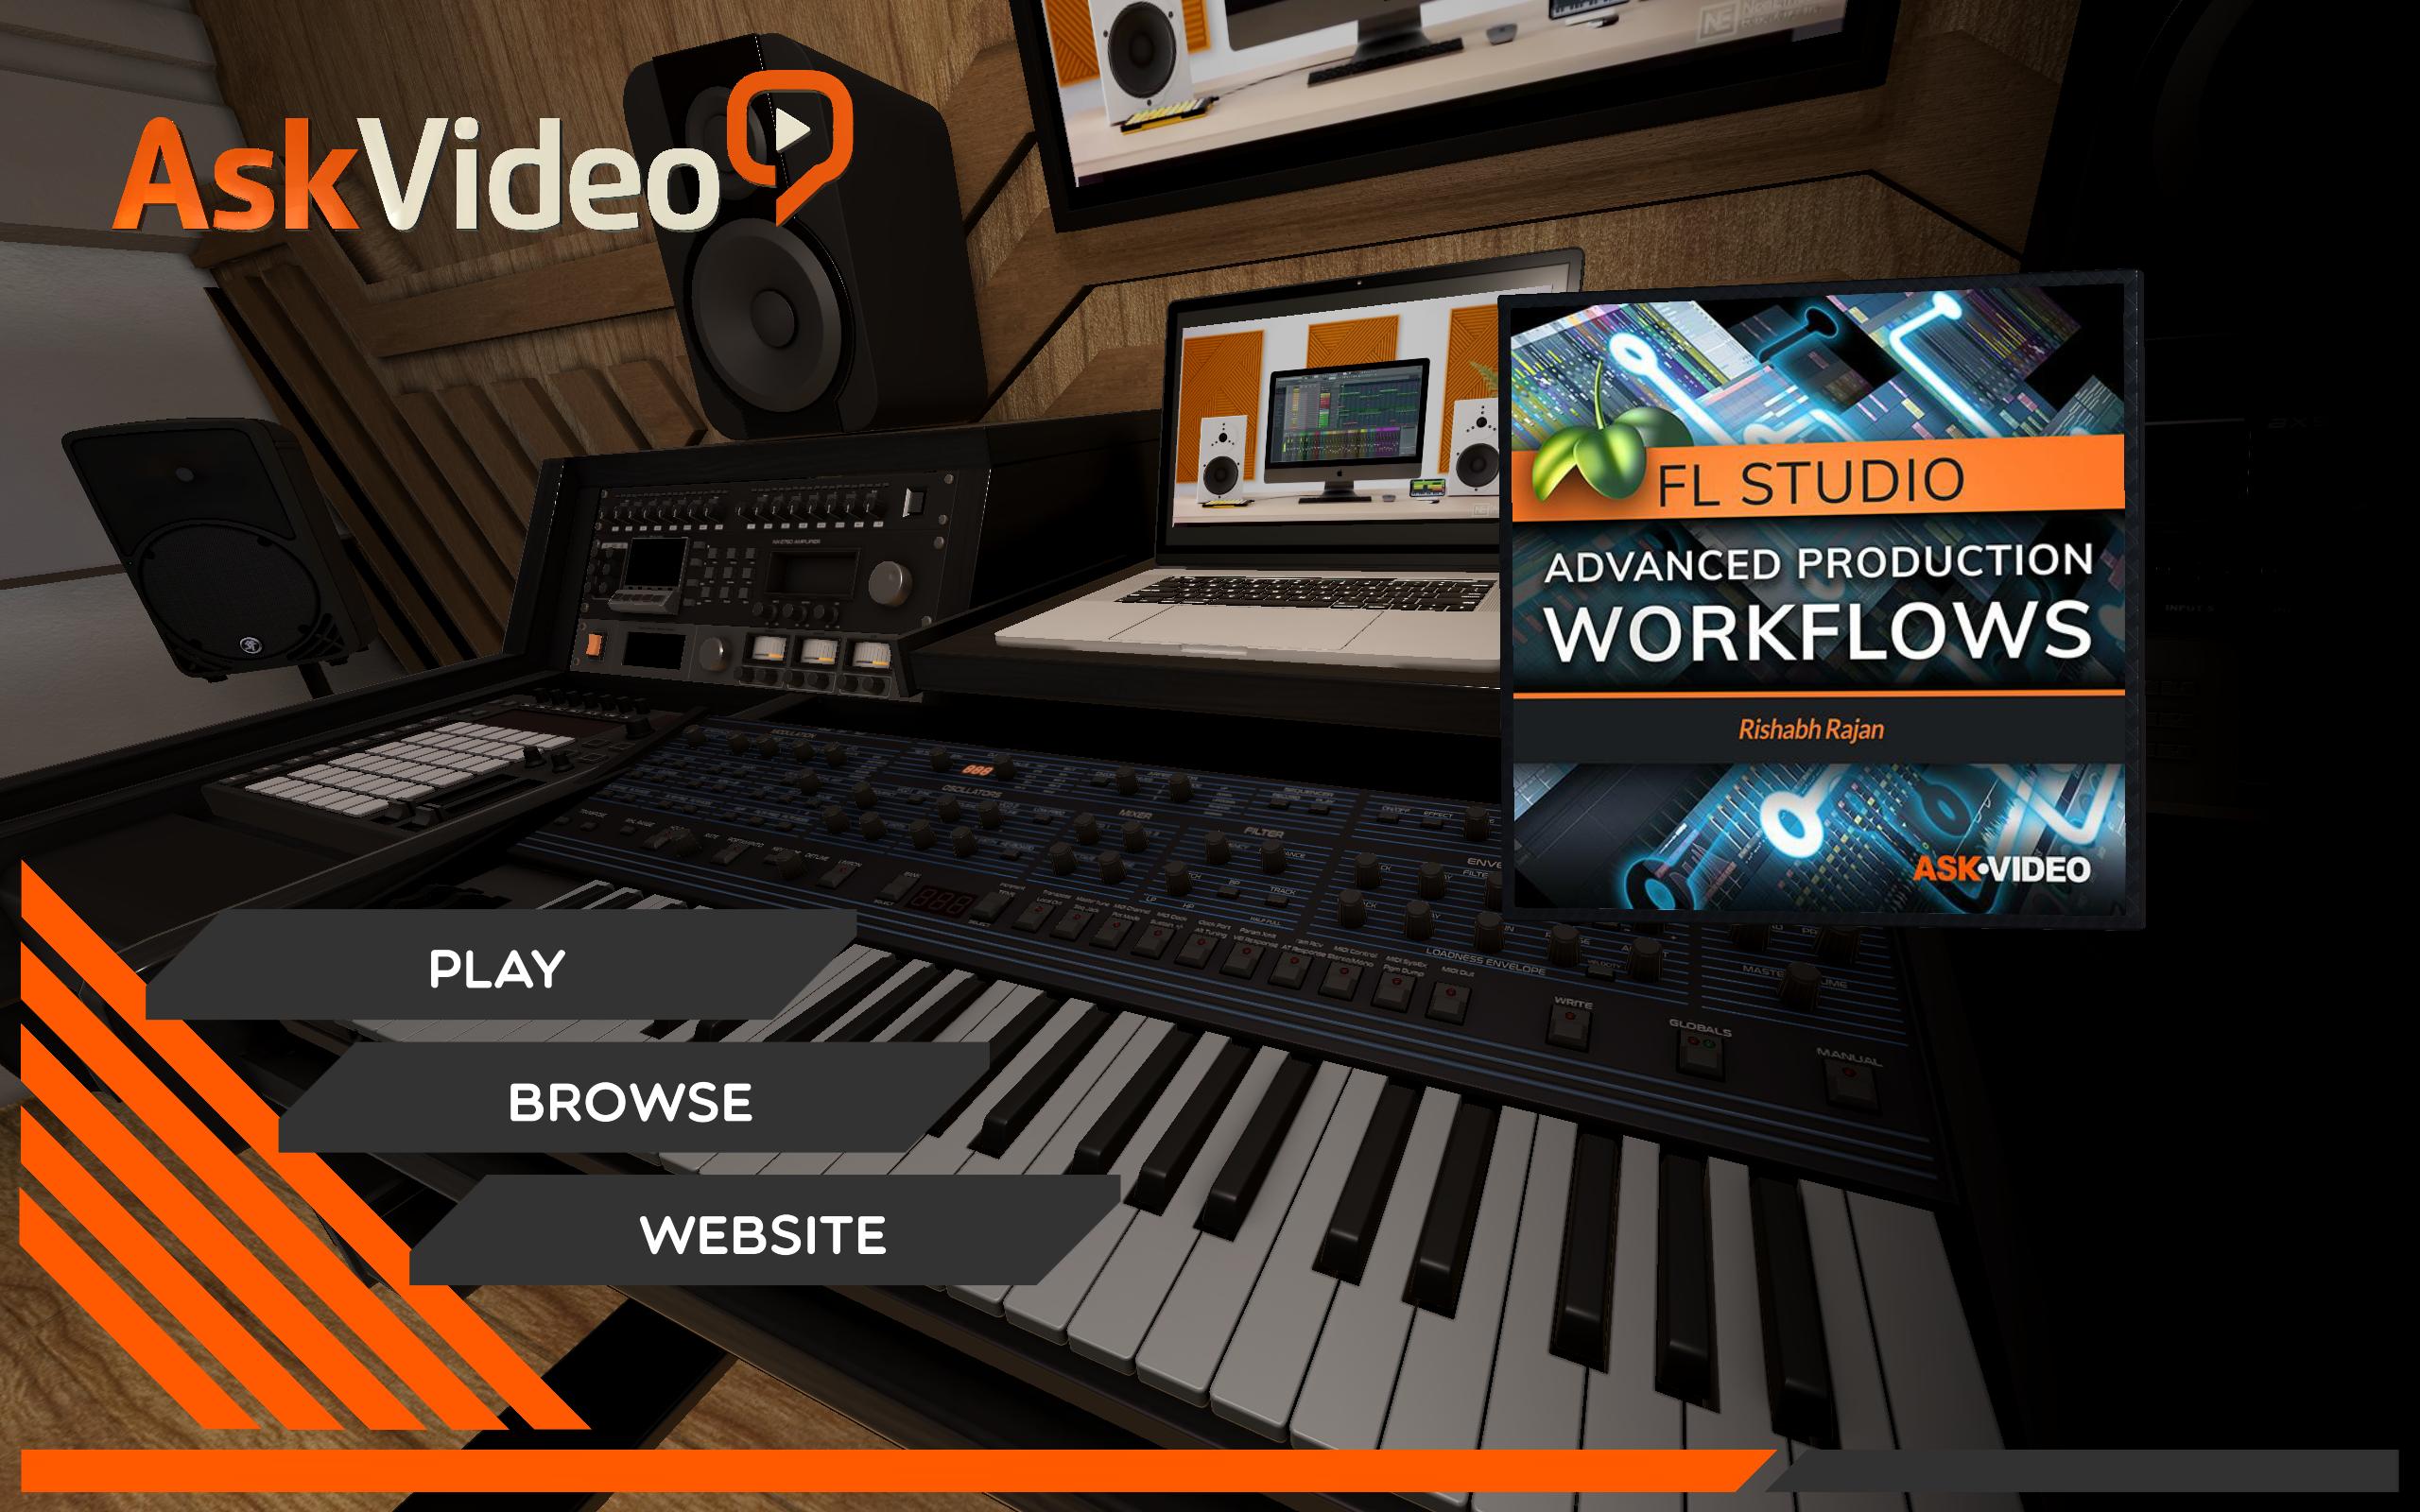 Adv. Production Workflows Course For FL Studio: Amazon.es ...